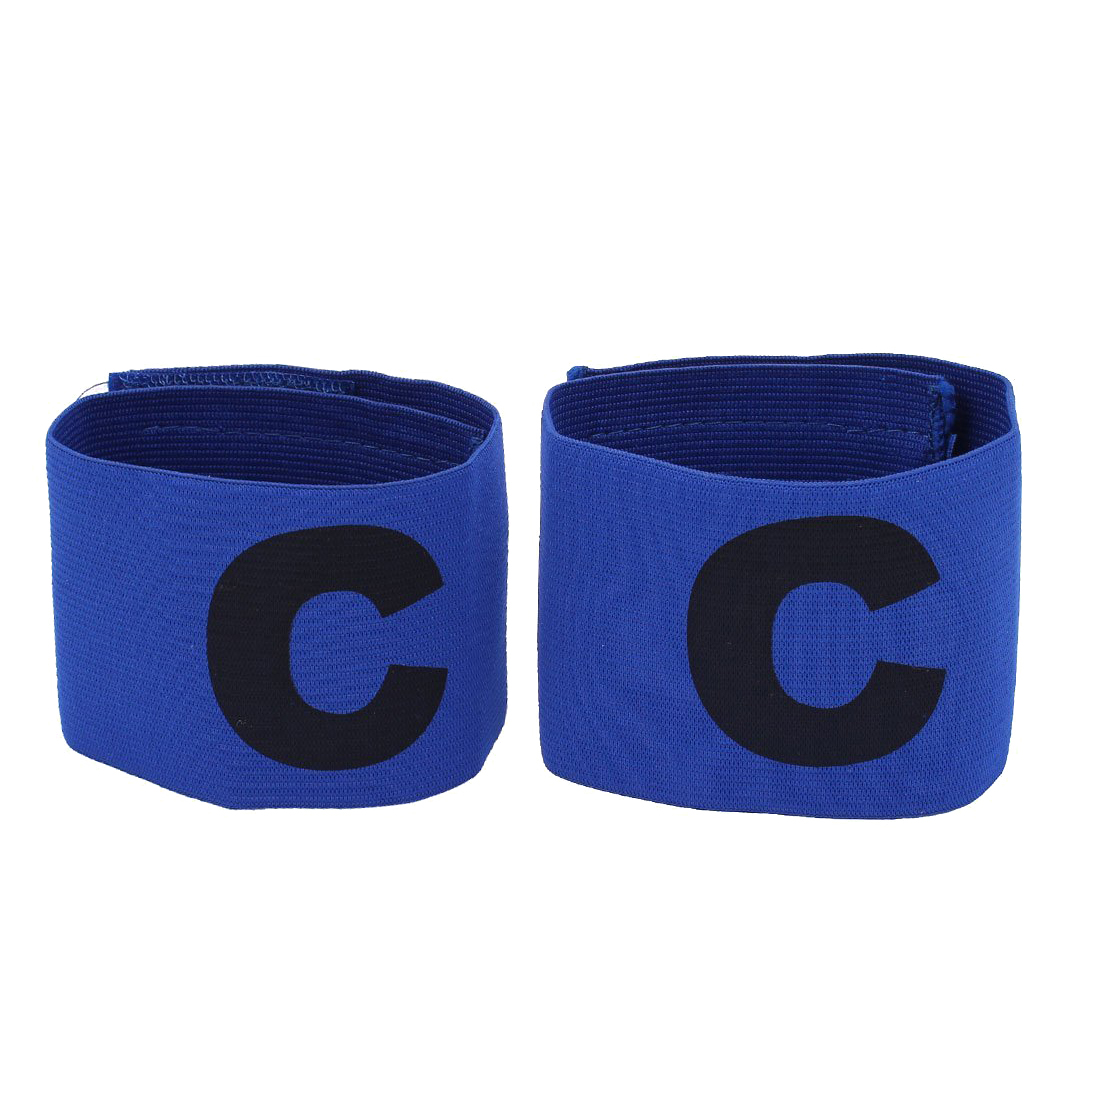 846e03199d31 Durable elástico Telas C Impresión Fútbol fútbol capitán brazalete 2 unids  azul en Manguitos de Hogar y Jardín en AliExpress.com